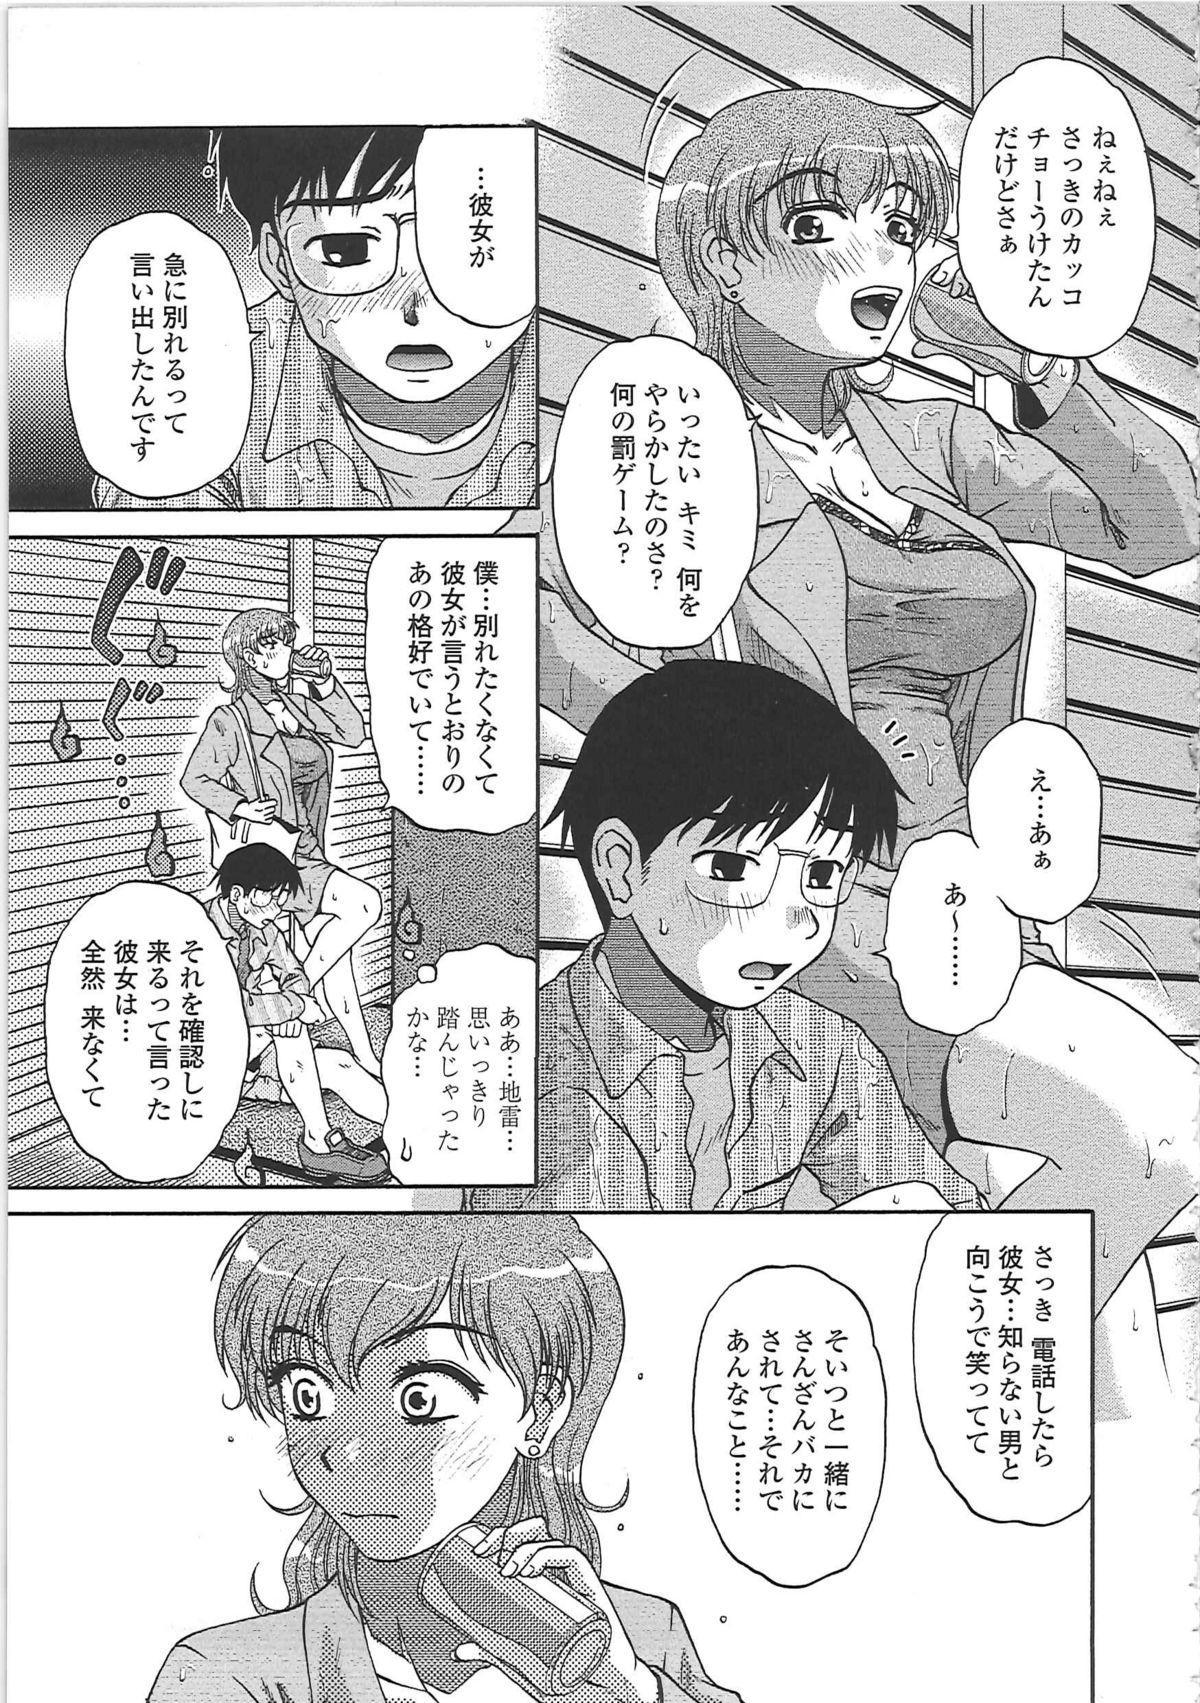 Nikuzuma Tsuushin - Erotic Wife Communication 149